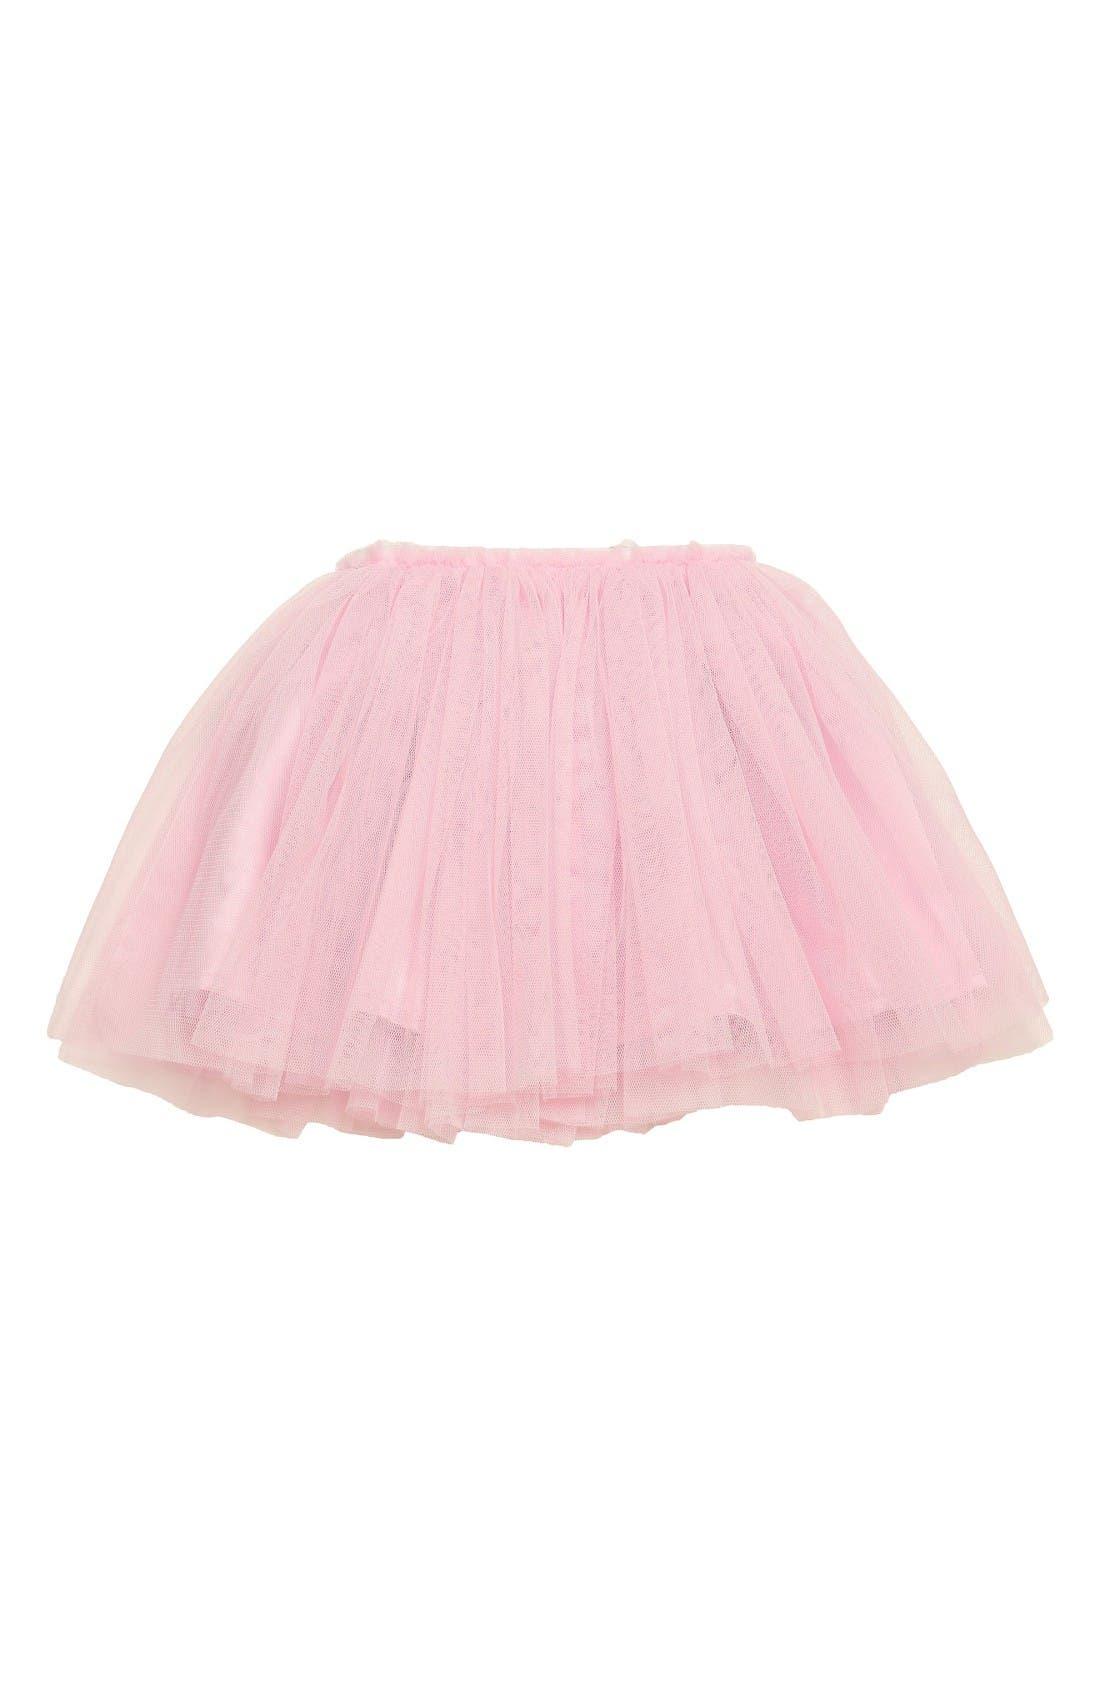 Tutu Skirt,                             Alternate thumbnail 2, color,                             Pink